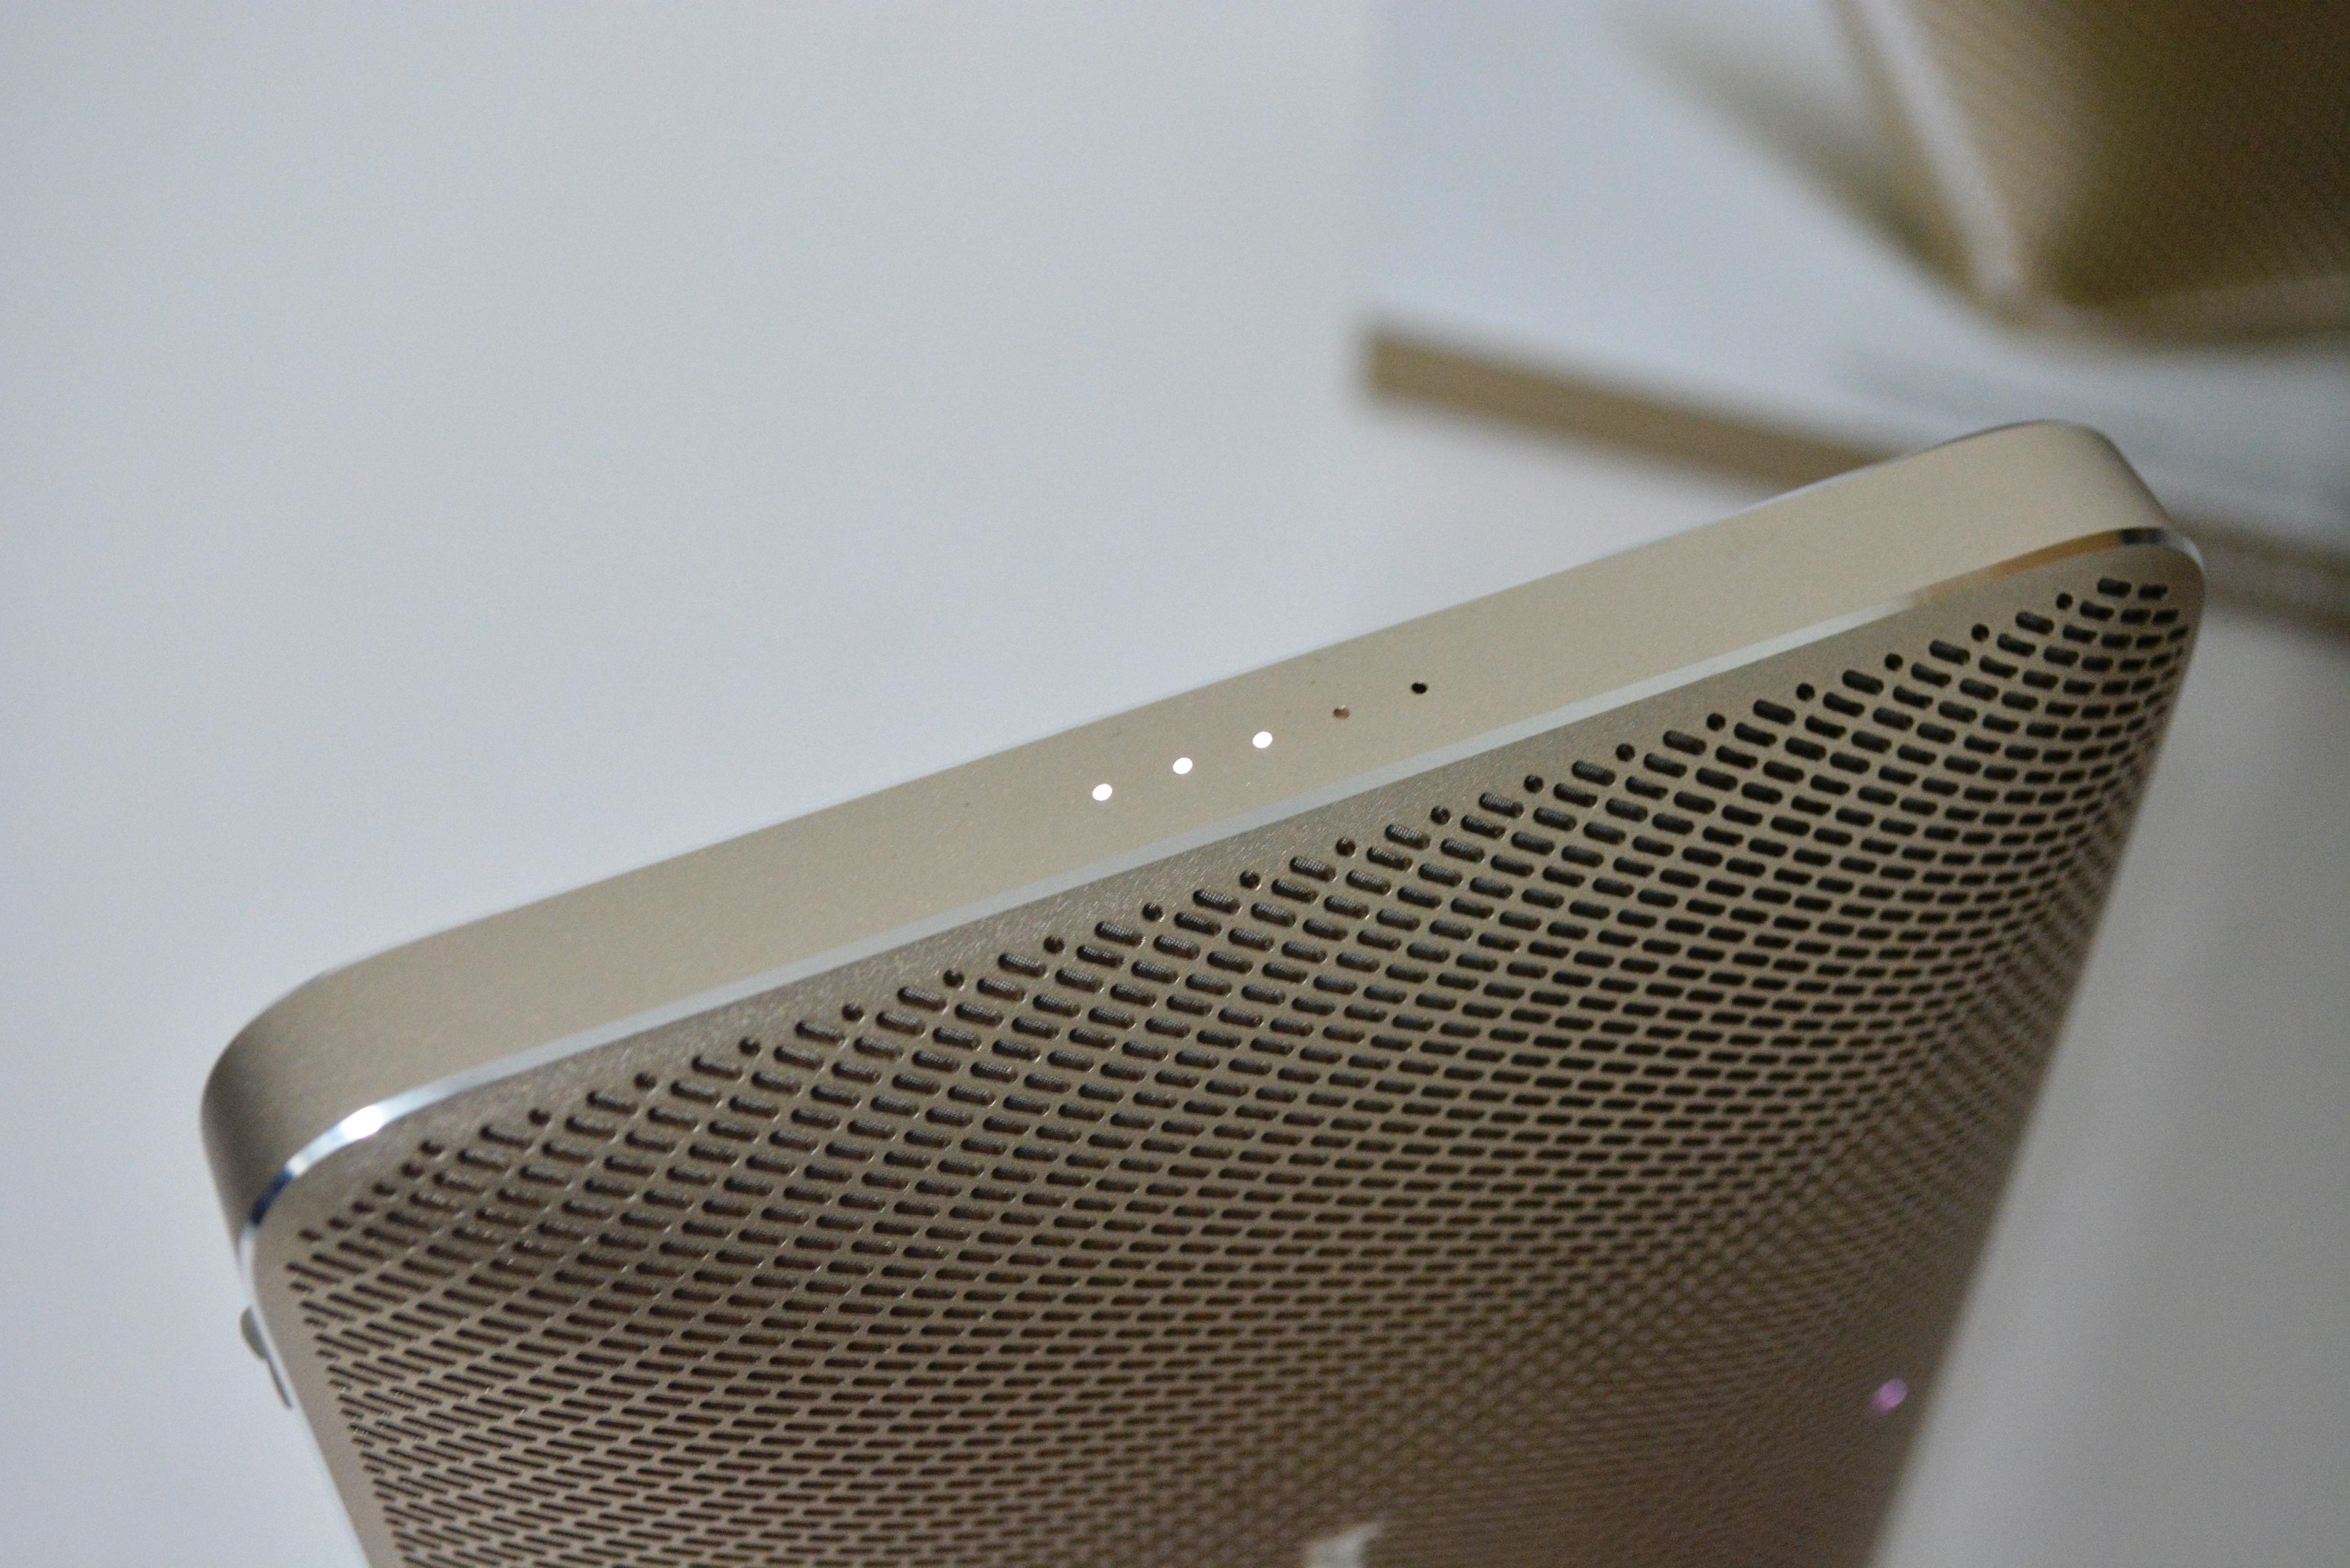 bluetooth speakers, esquire 2, harman kardon, portable speakers, speakers